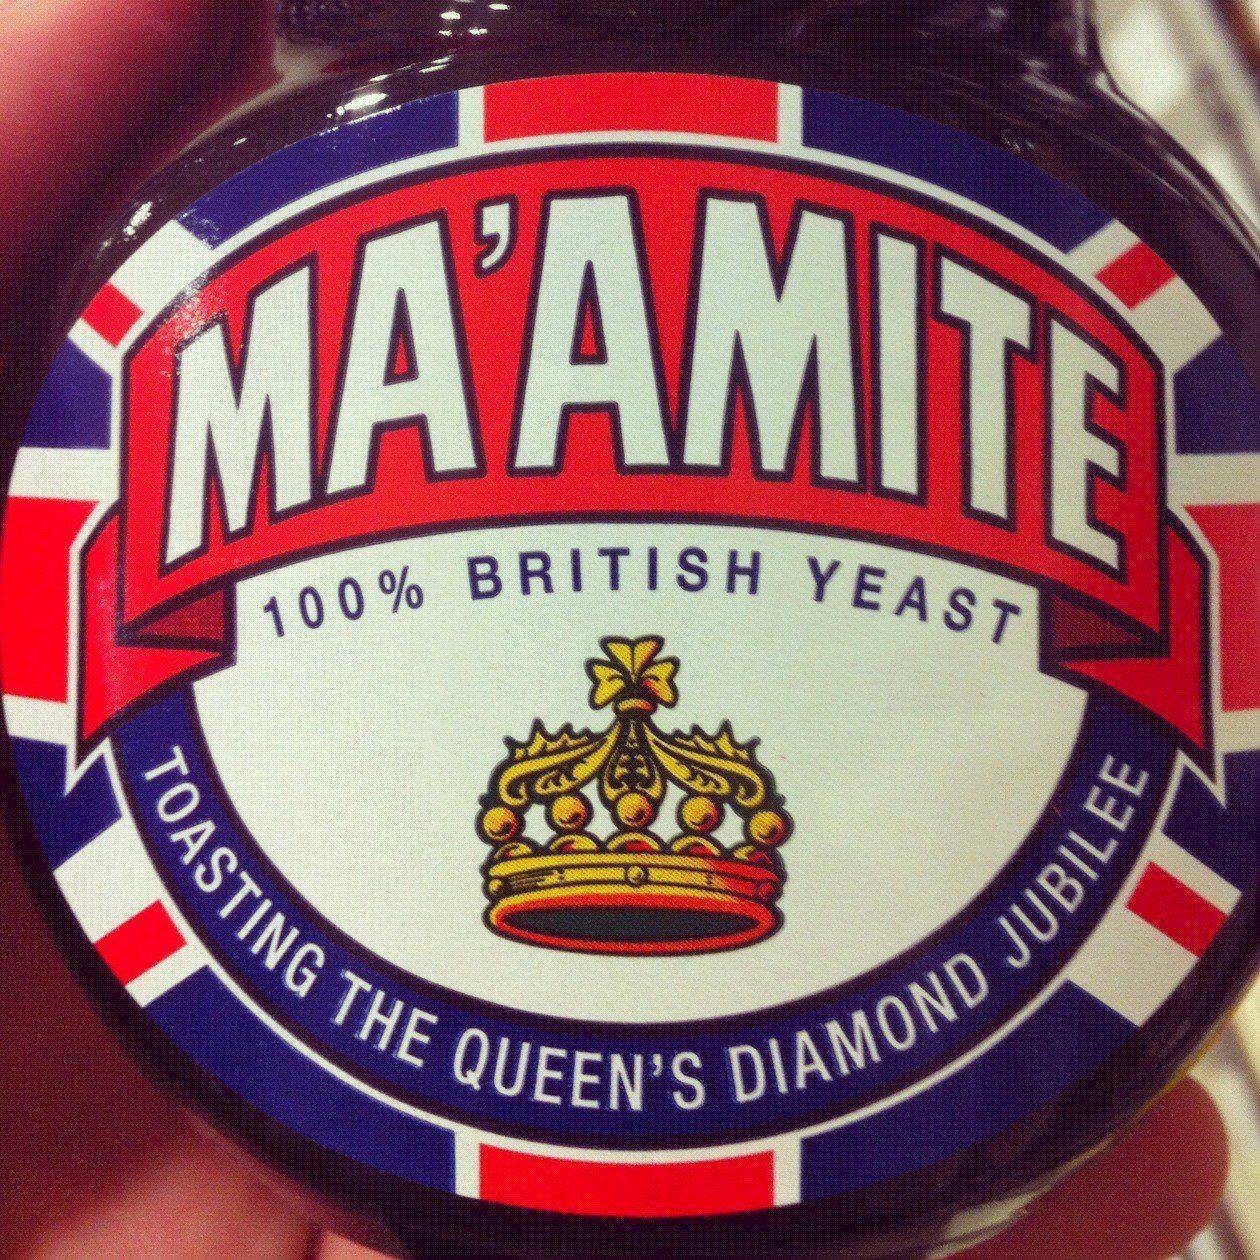 Ma'amite Marmite, The Myndset Digital marketing strategy